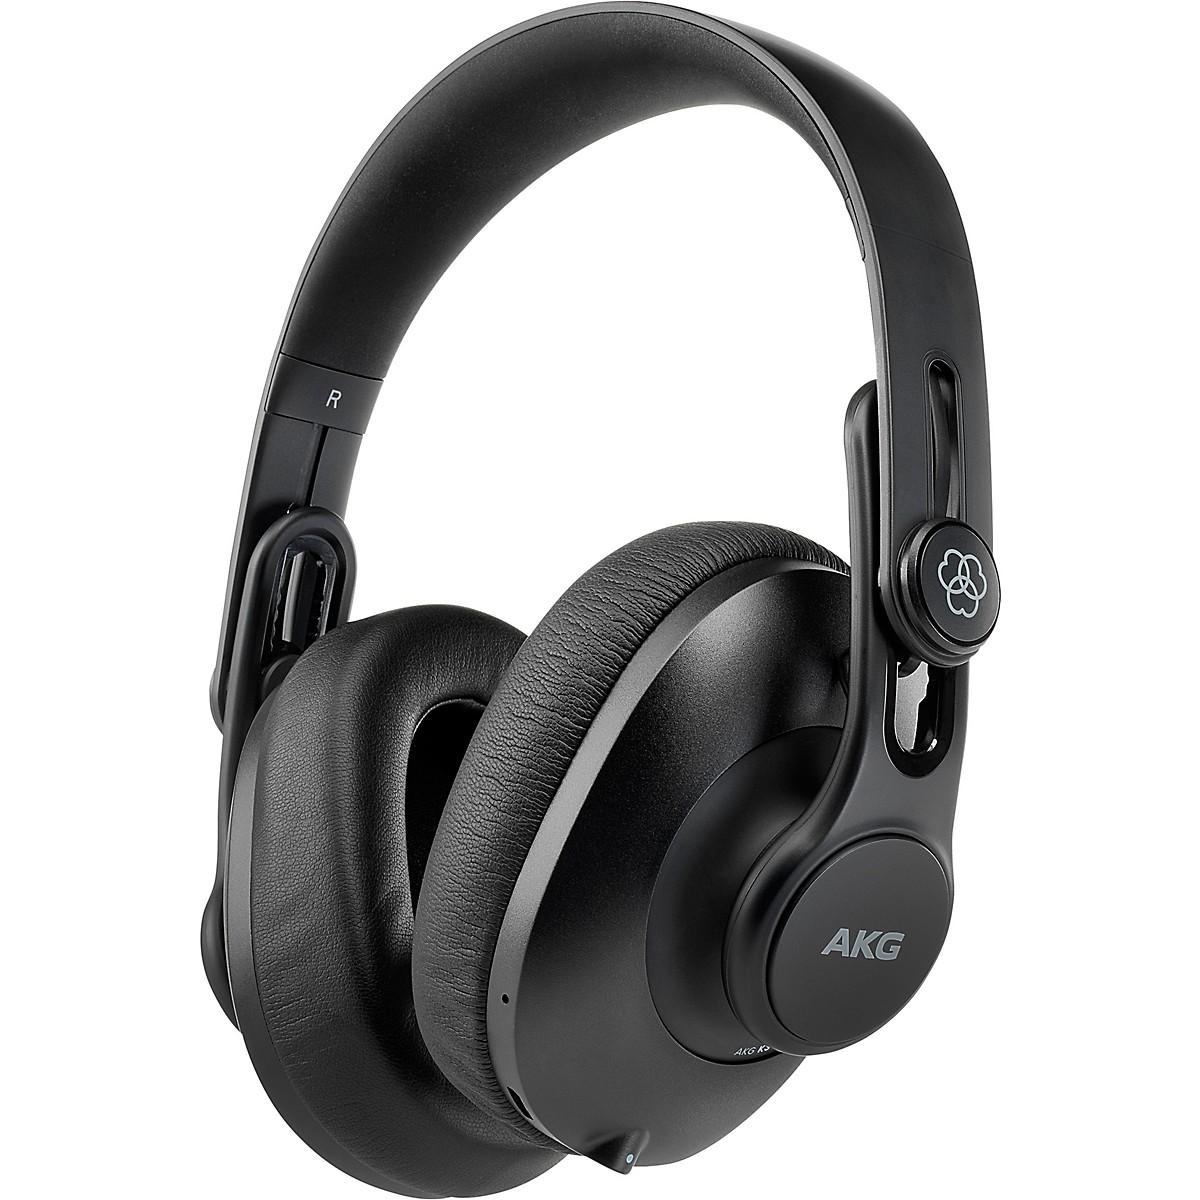 AKG K361-BT Over-Ear, Closed-Back Foldable Studio Headphones with Bluetooth